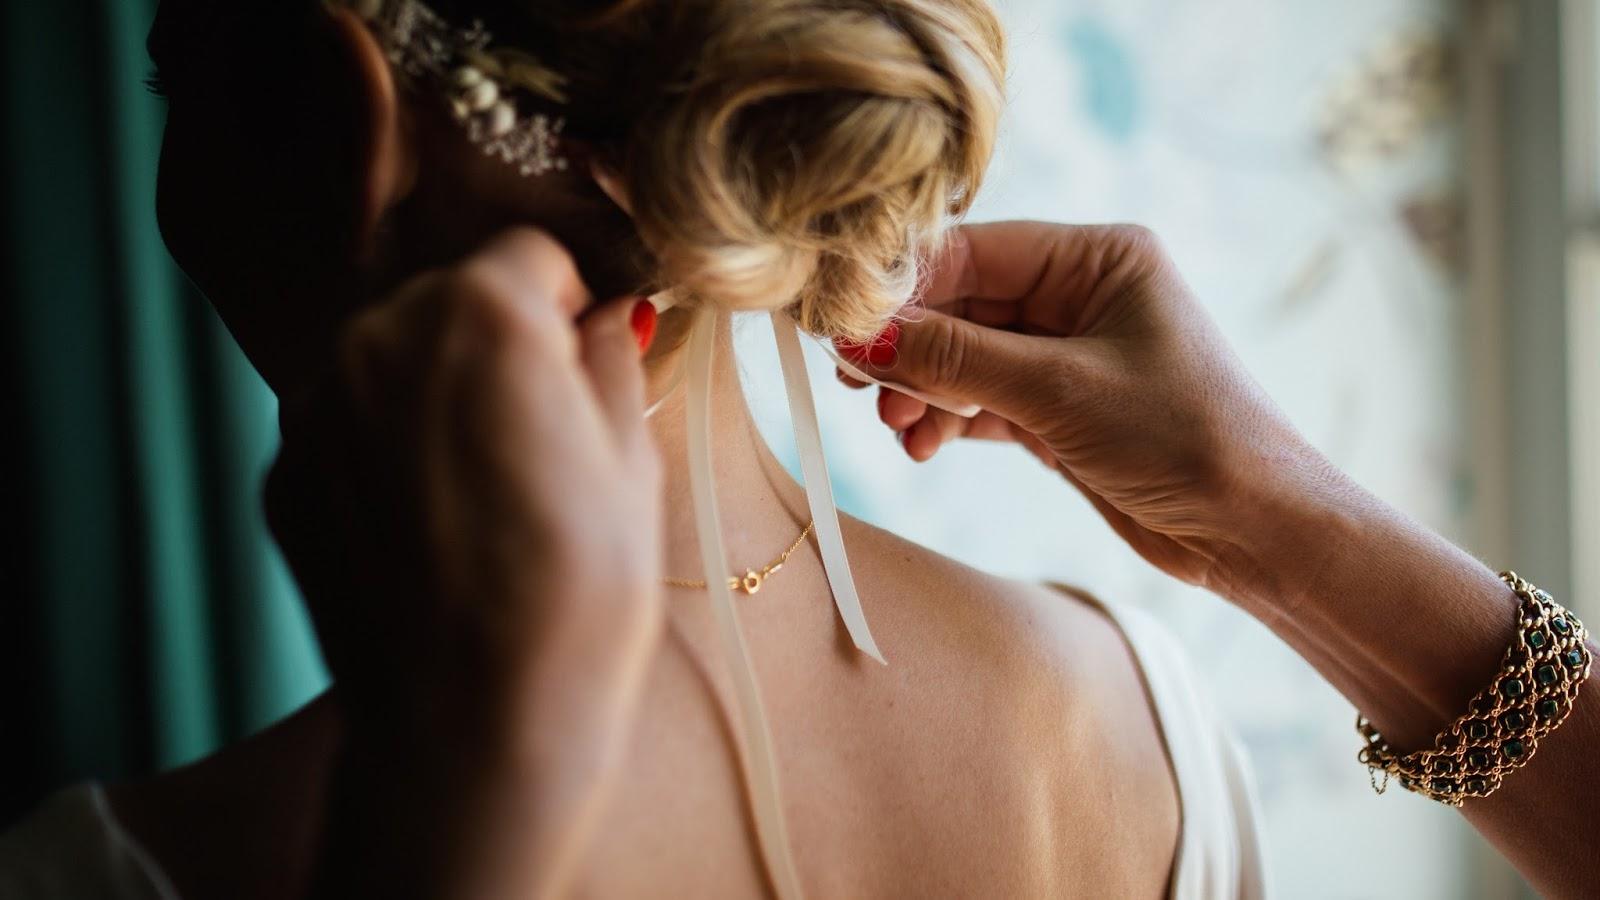 Stylowe dodatki panny młodej - ozdoby do włosów, dodatki ślubne, gdzie kupić dodatki ślubne, blog modowy